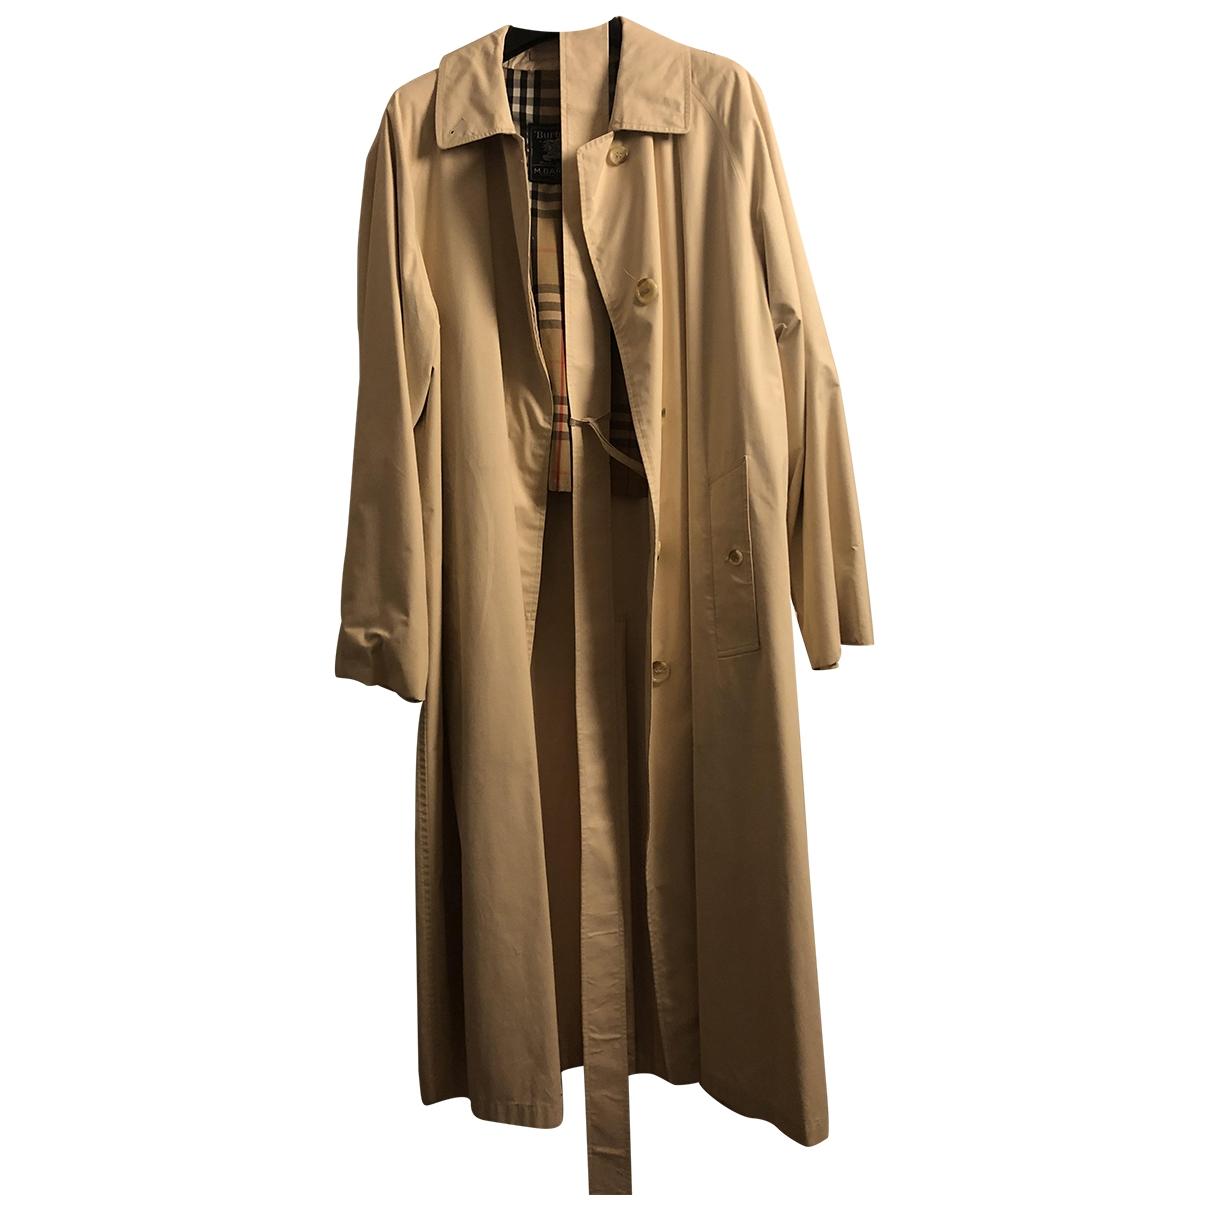 Burberry \N Beige Cotton Trench coat for Women 46 IT